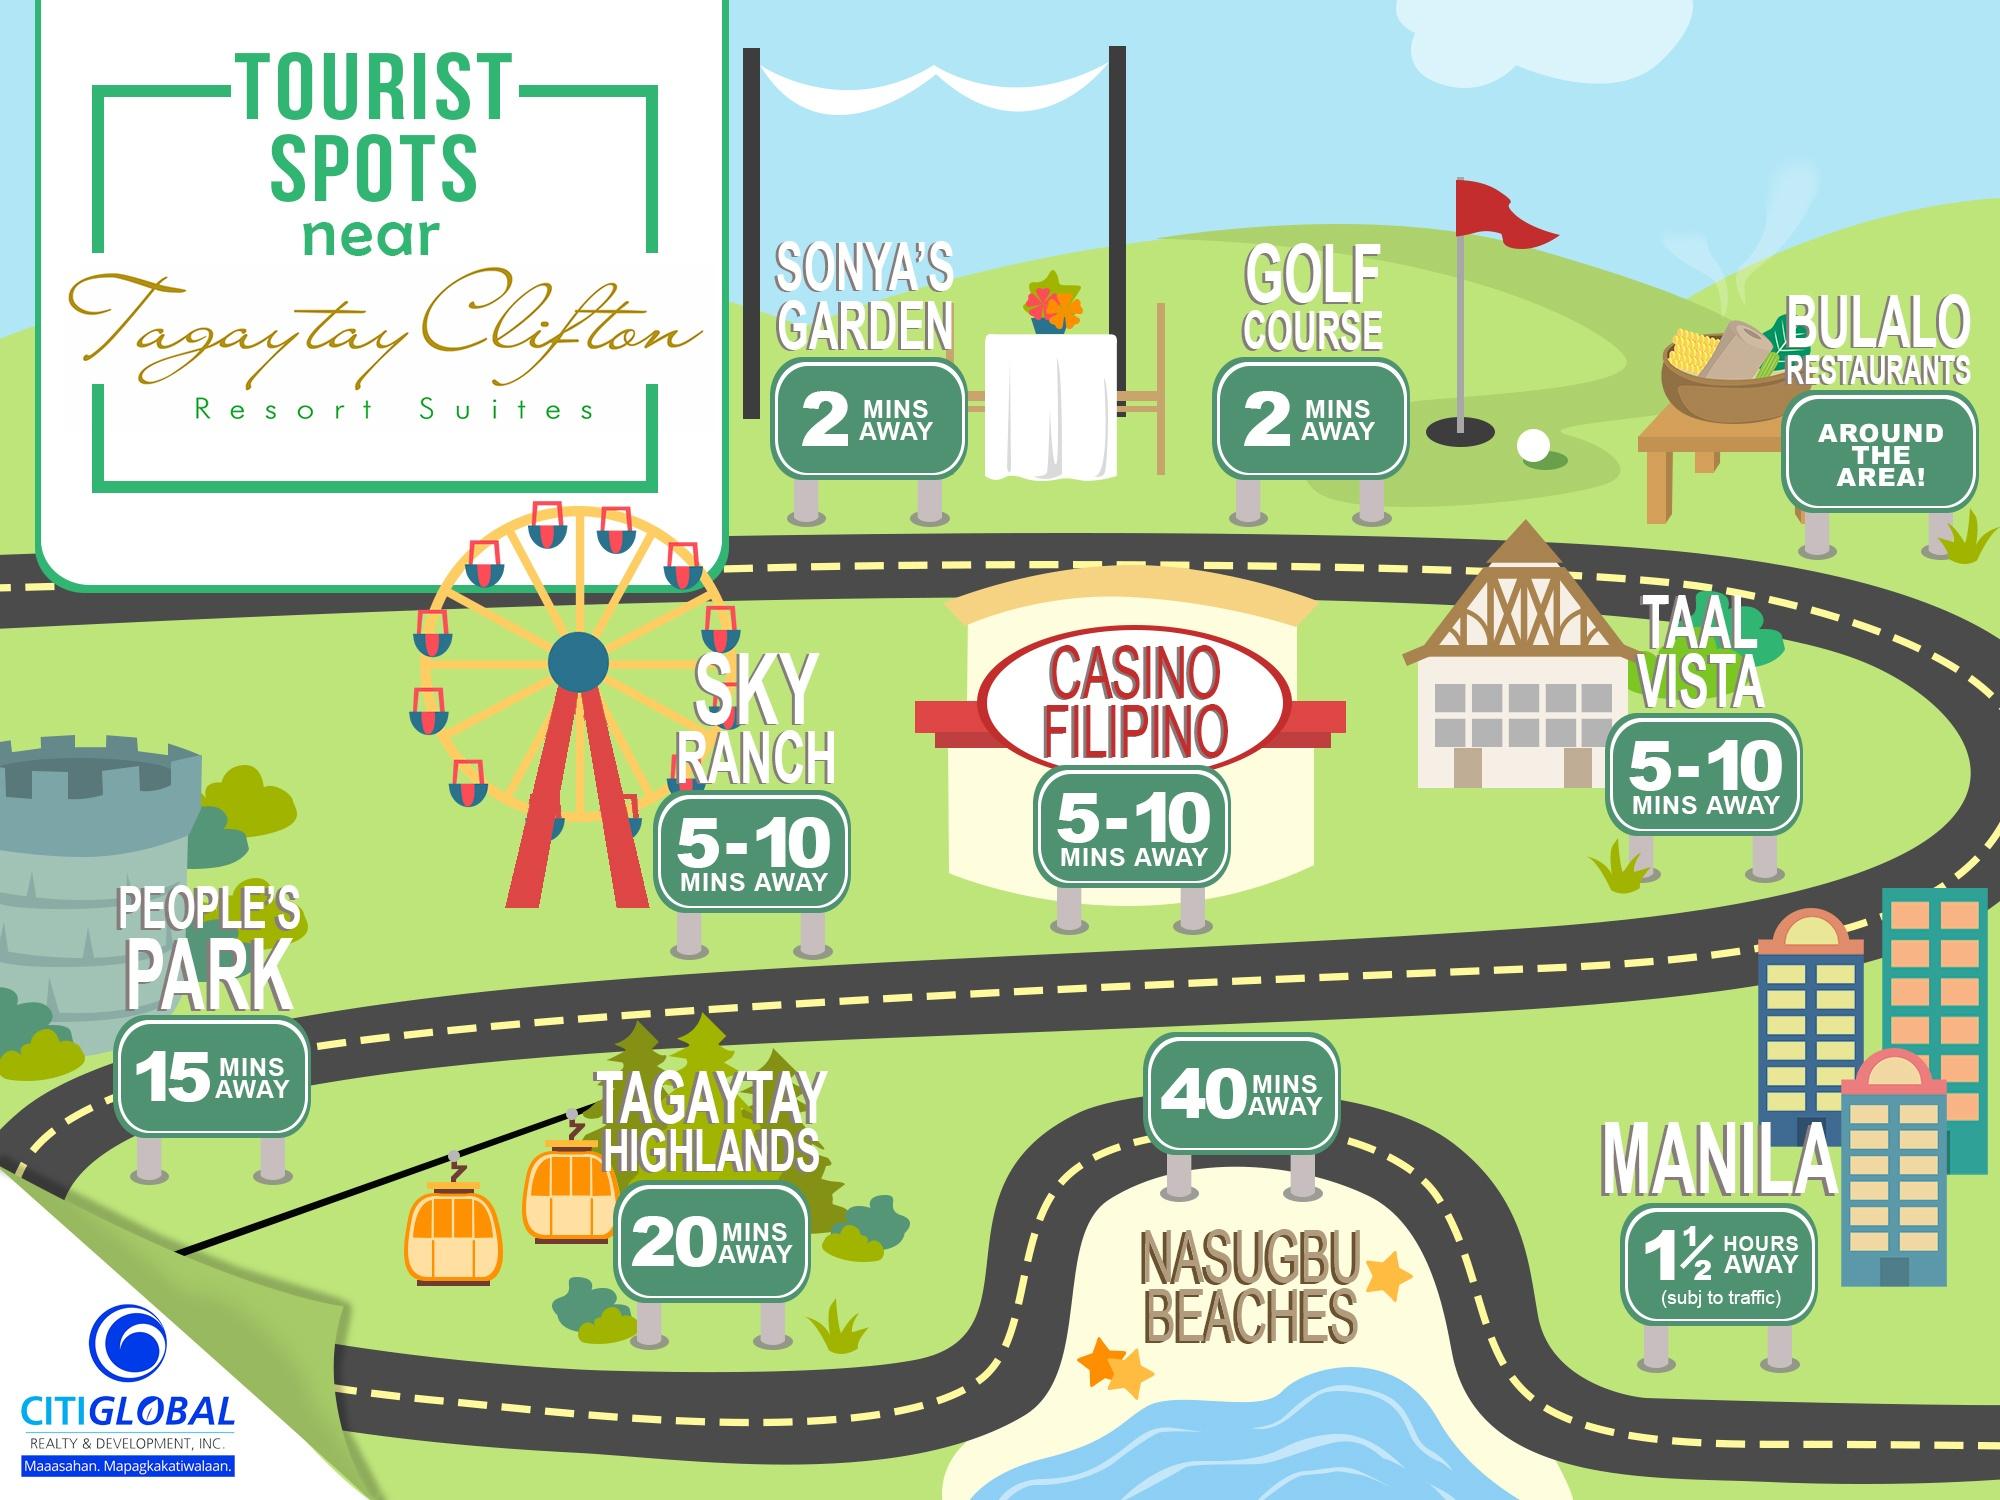 Tourist Spots Near Tagaytay Clifton Resort Suites